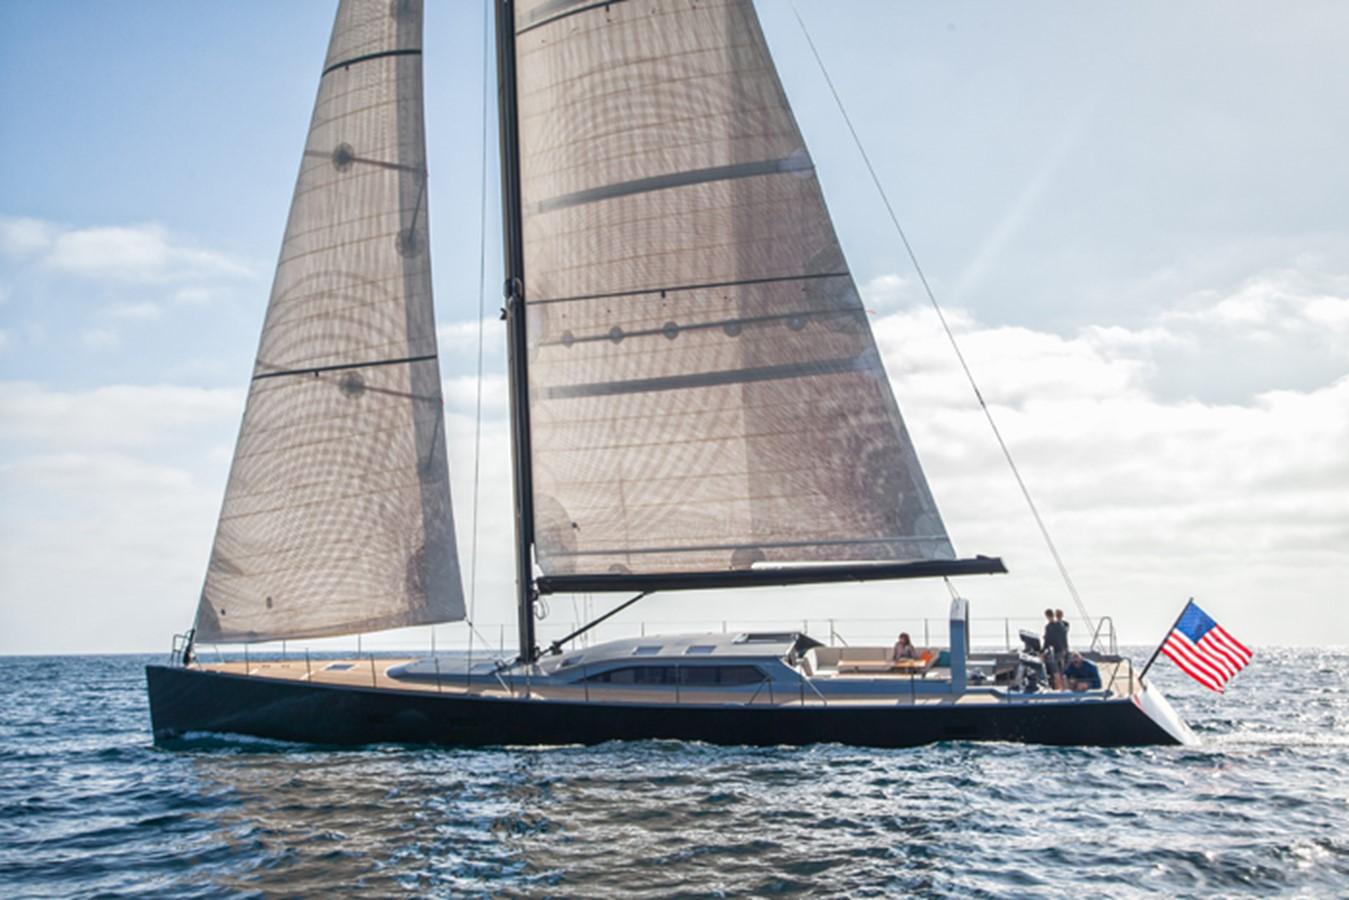 AANDEEL EXTERIOR 1996 GOETZ CUSTOM BOATS/DERECKTOR SHIPYARDS Sparkman & Stephens Designed Performance Sailing Yacht Cruising Sailboat 2585490